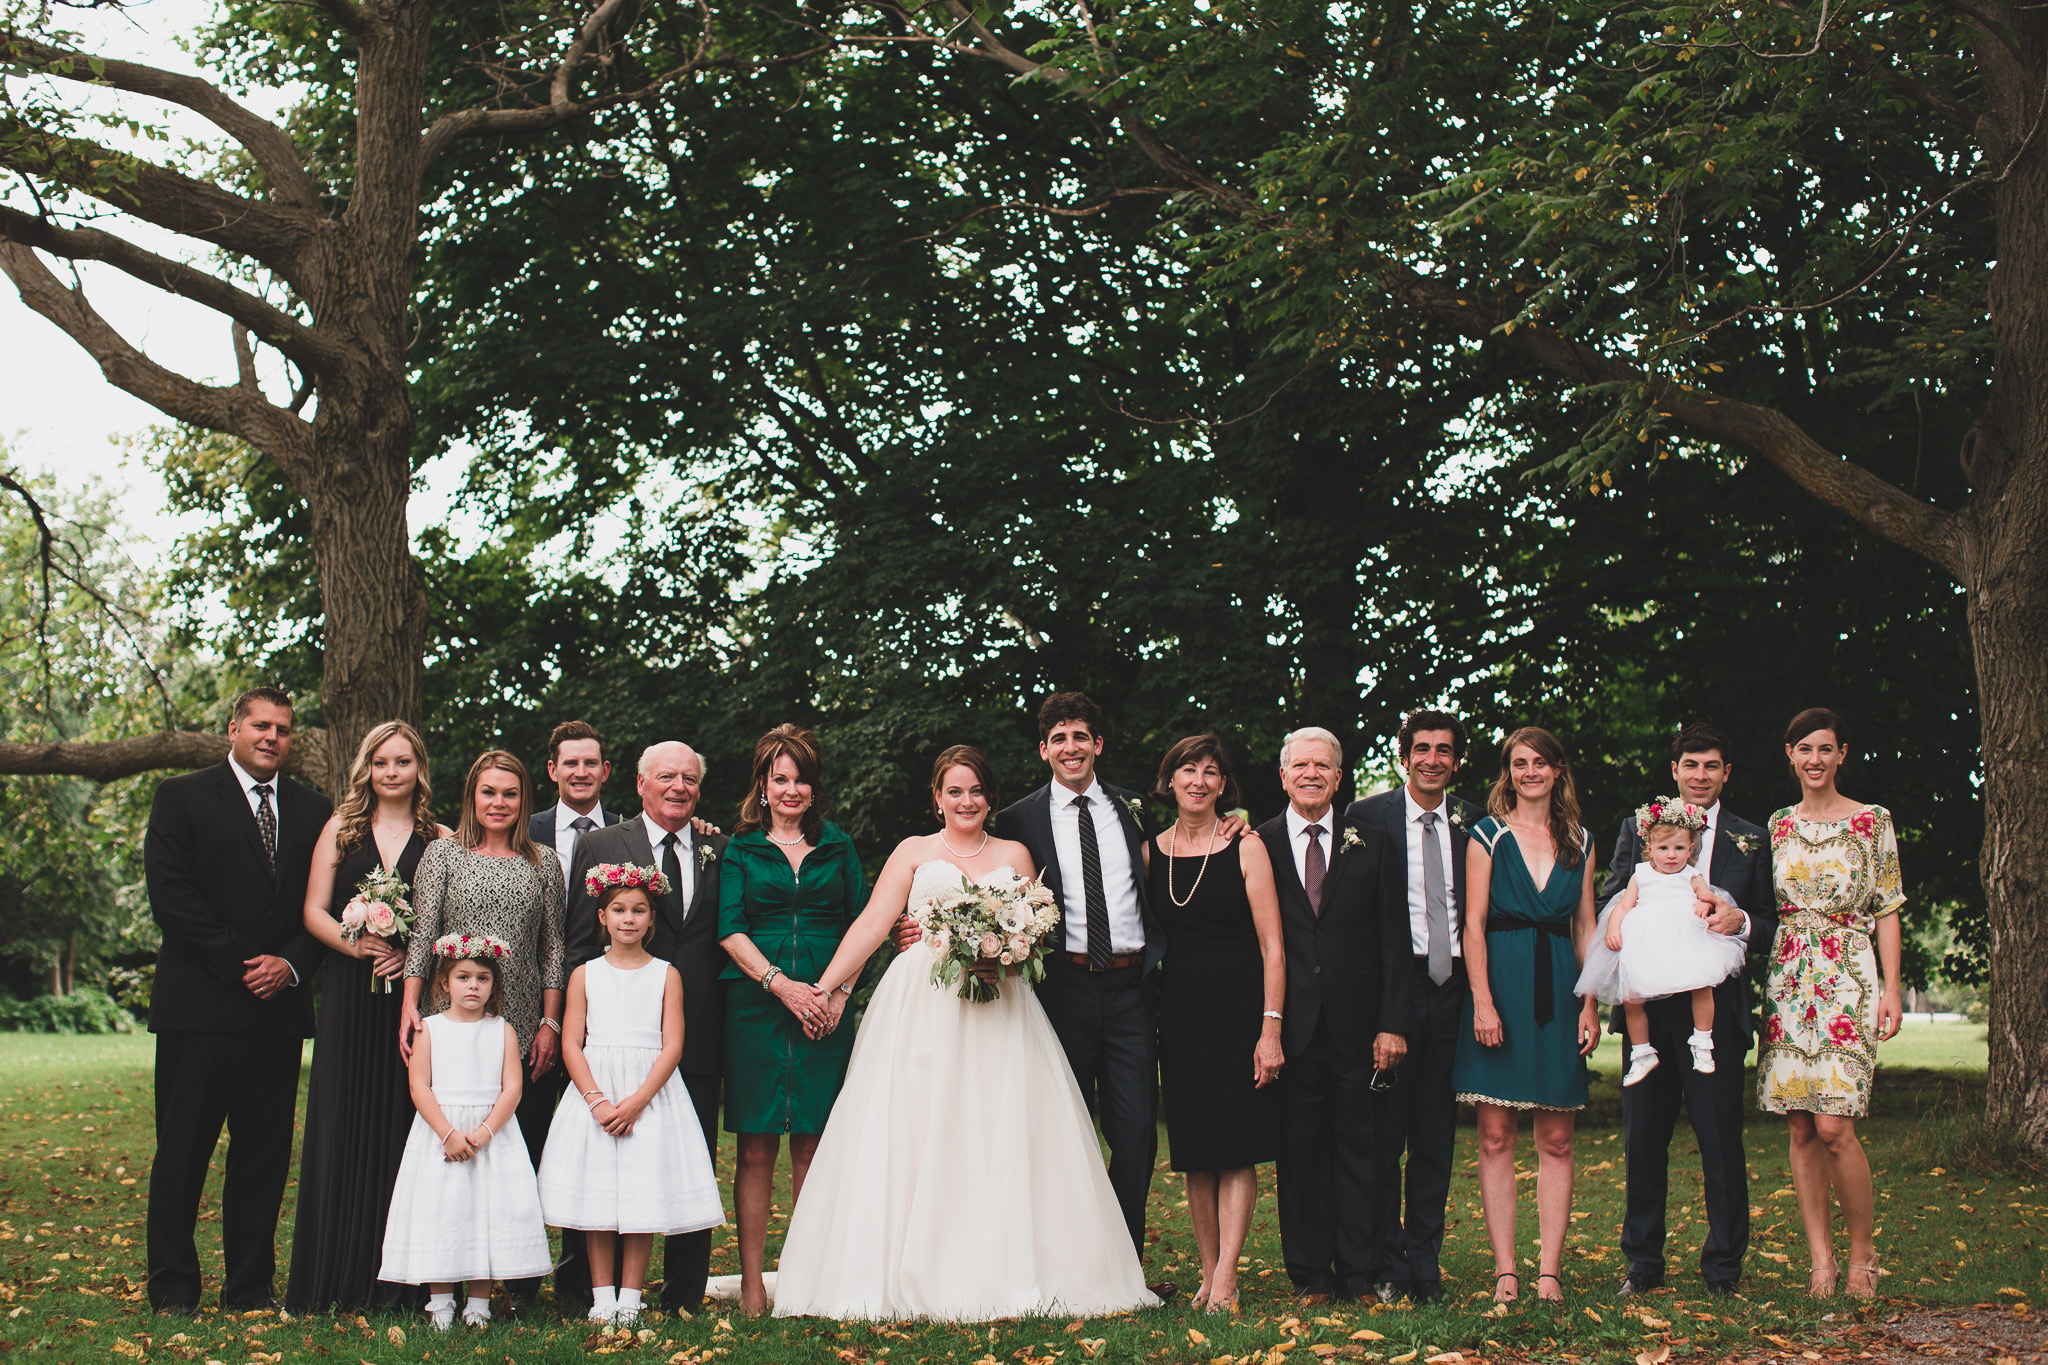 Taking family photos on the wedding day